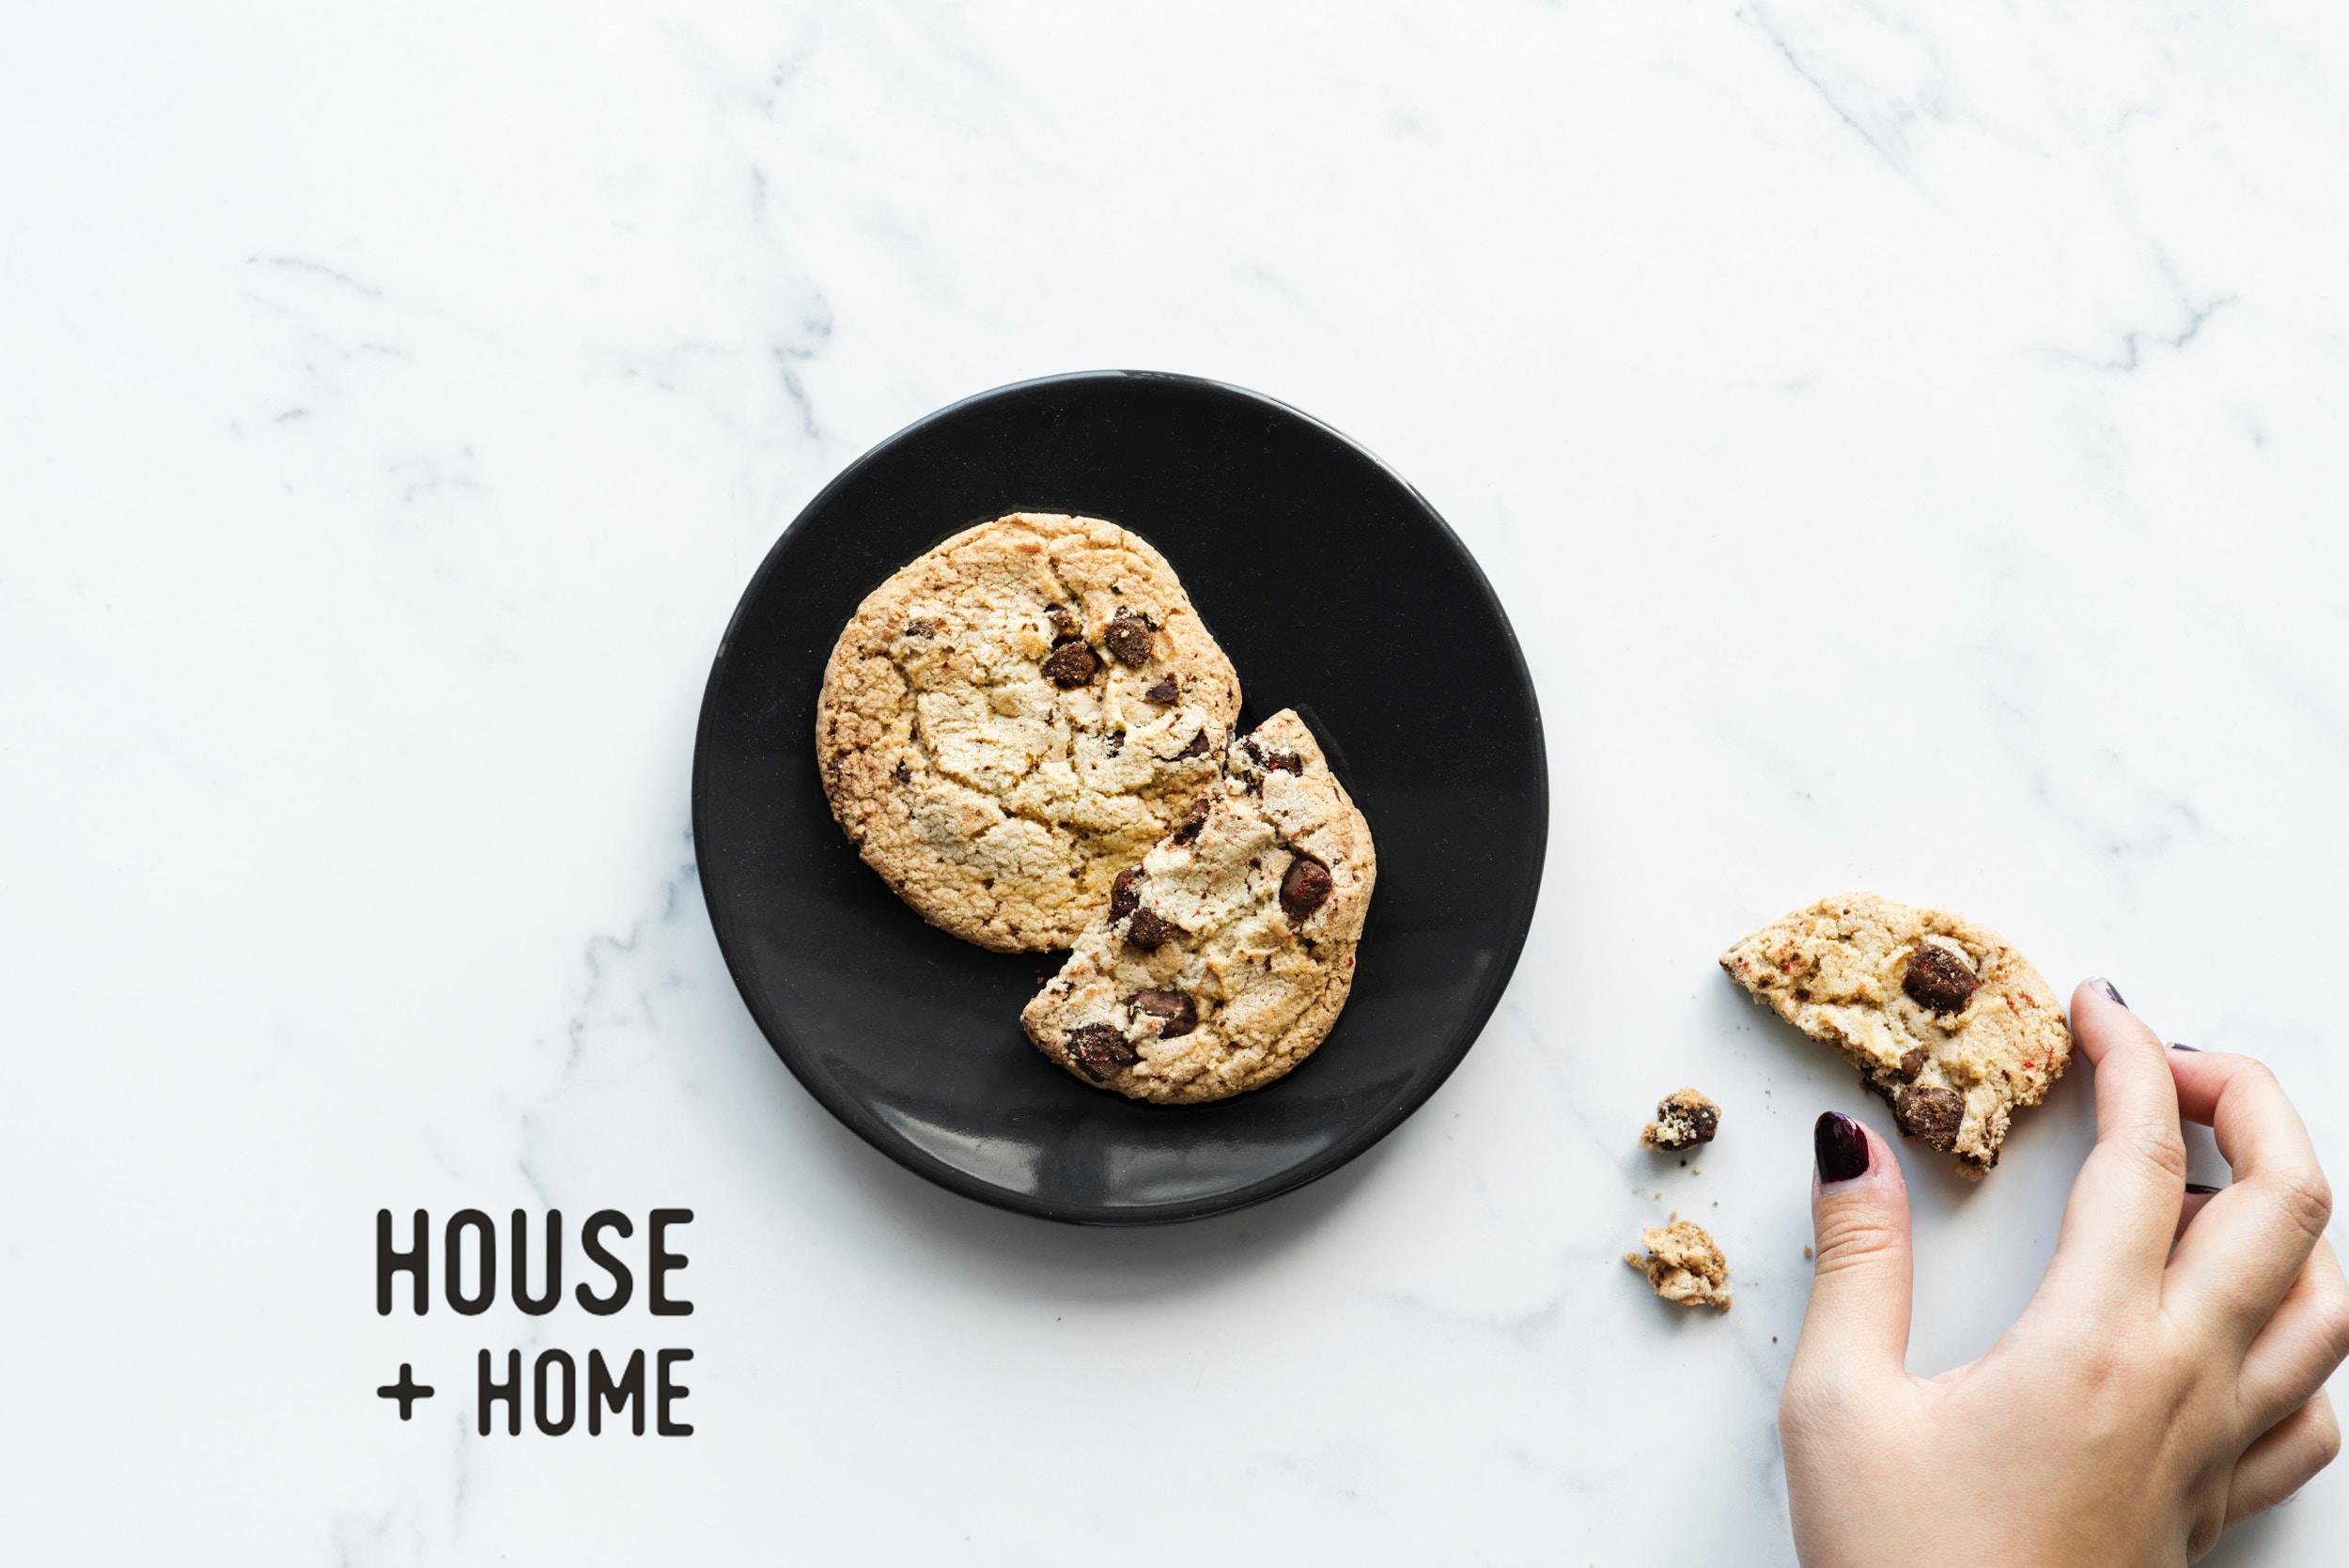 House + home image.jpg